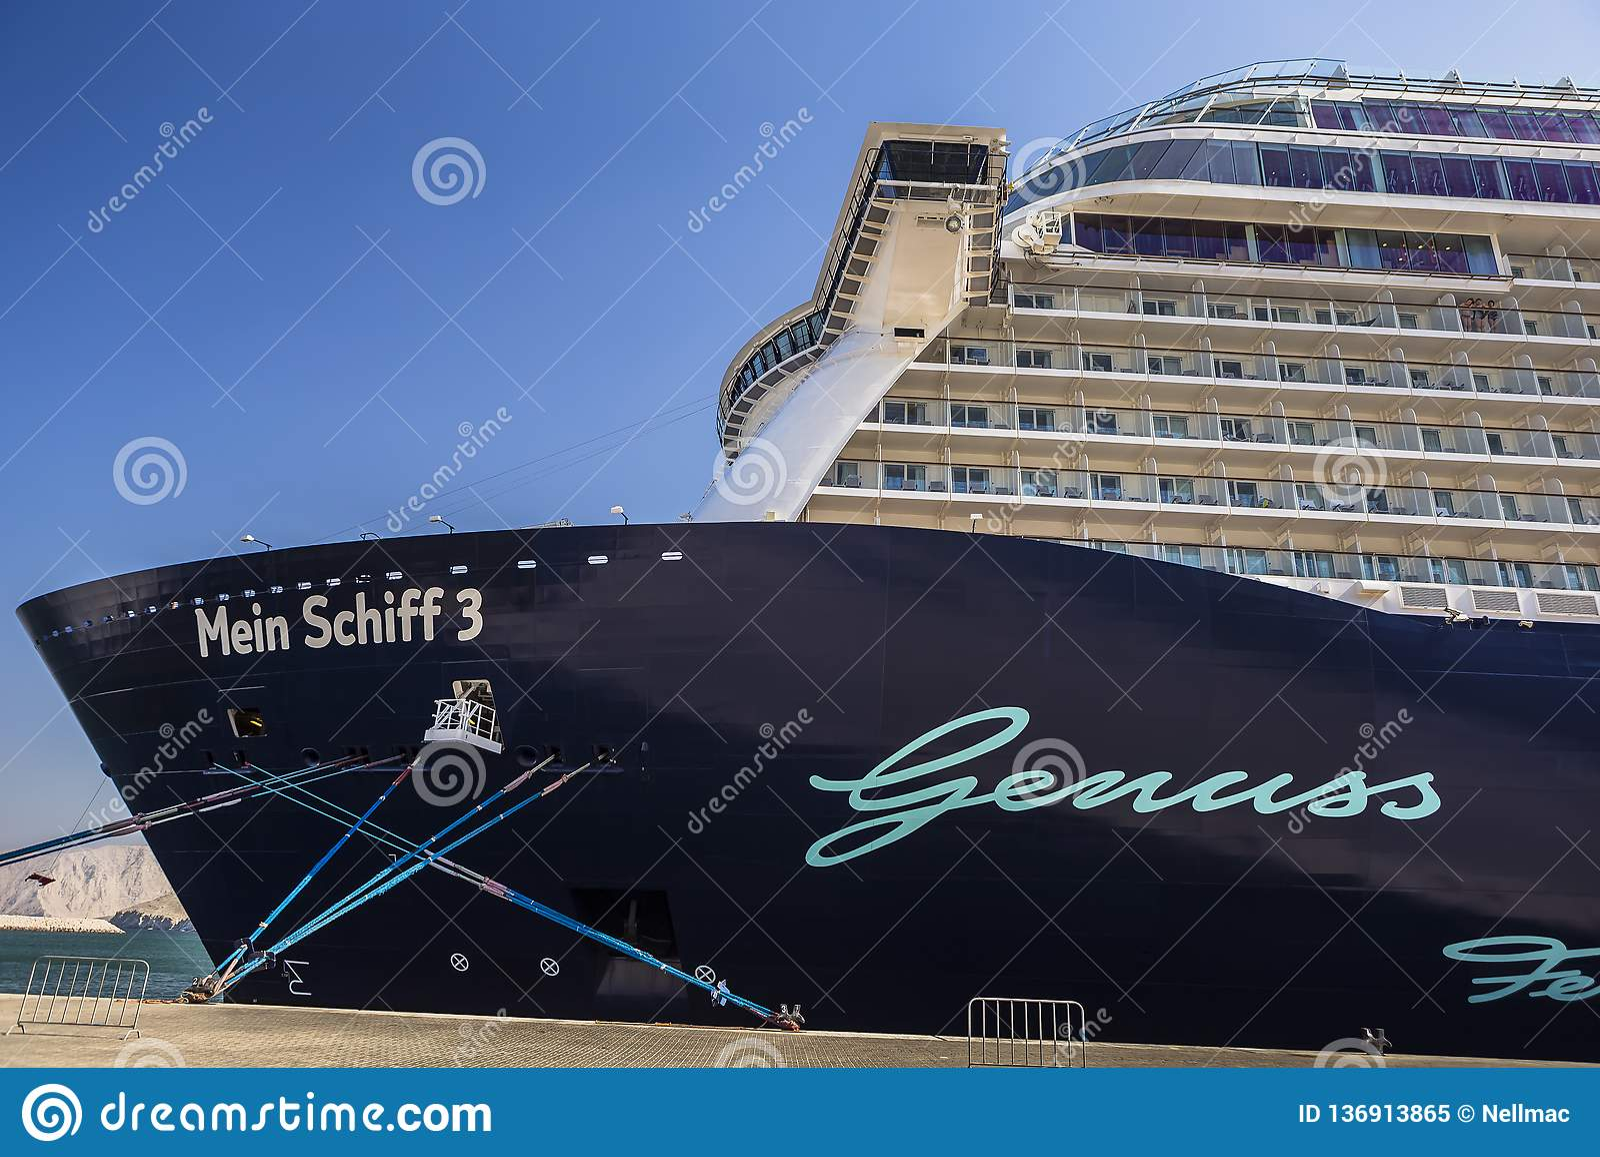 tui cruises mein schiff 3